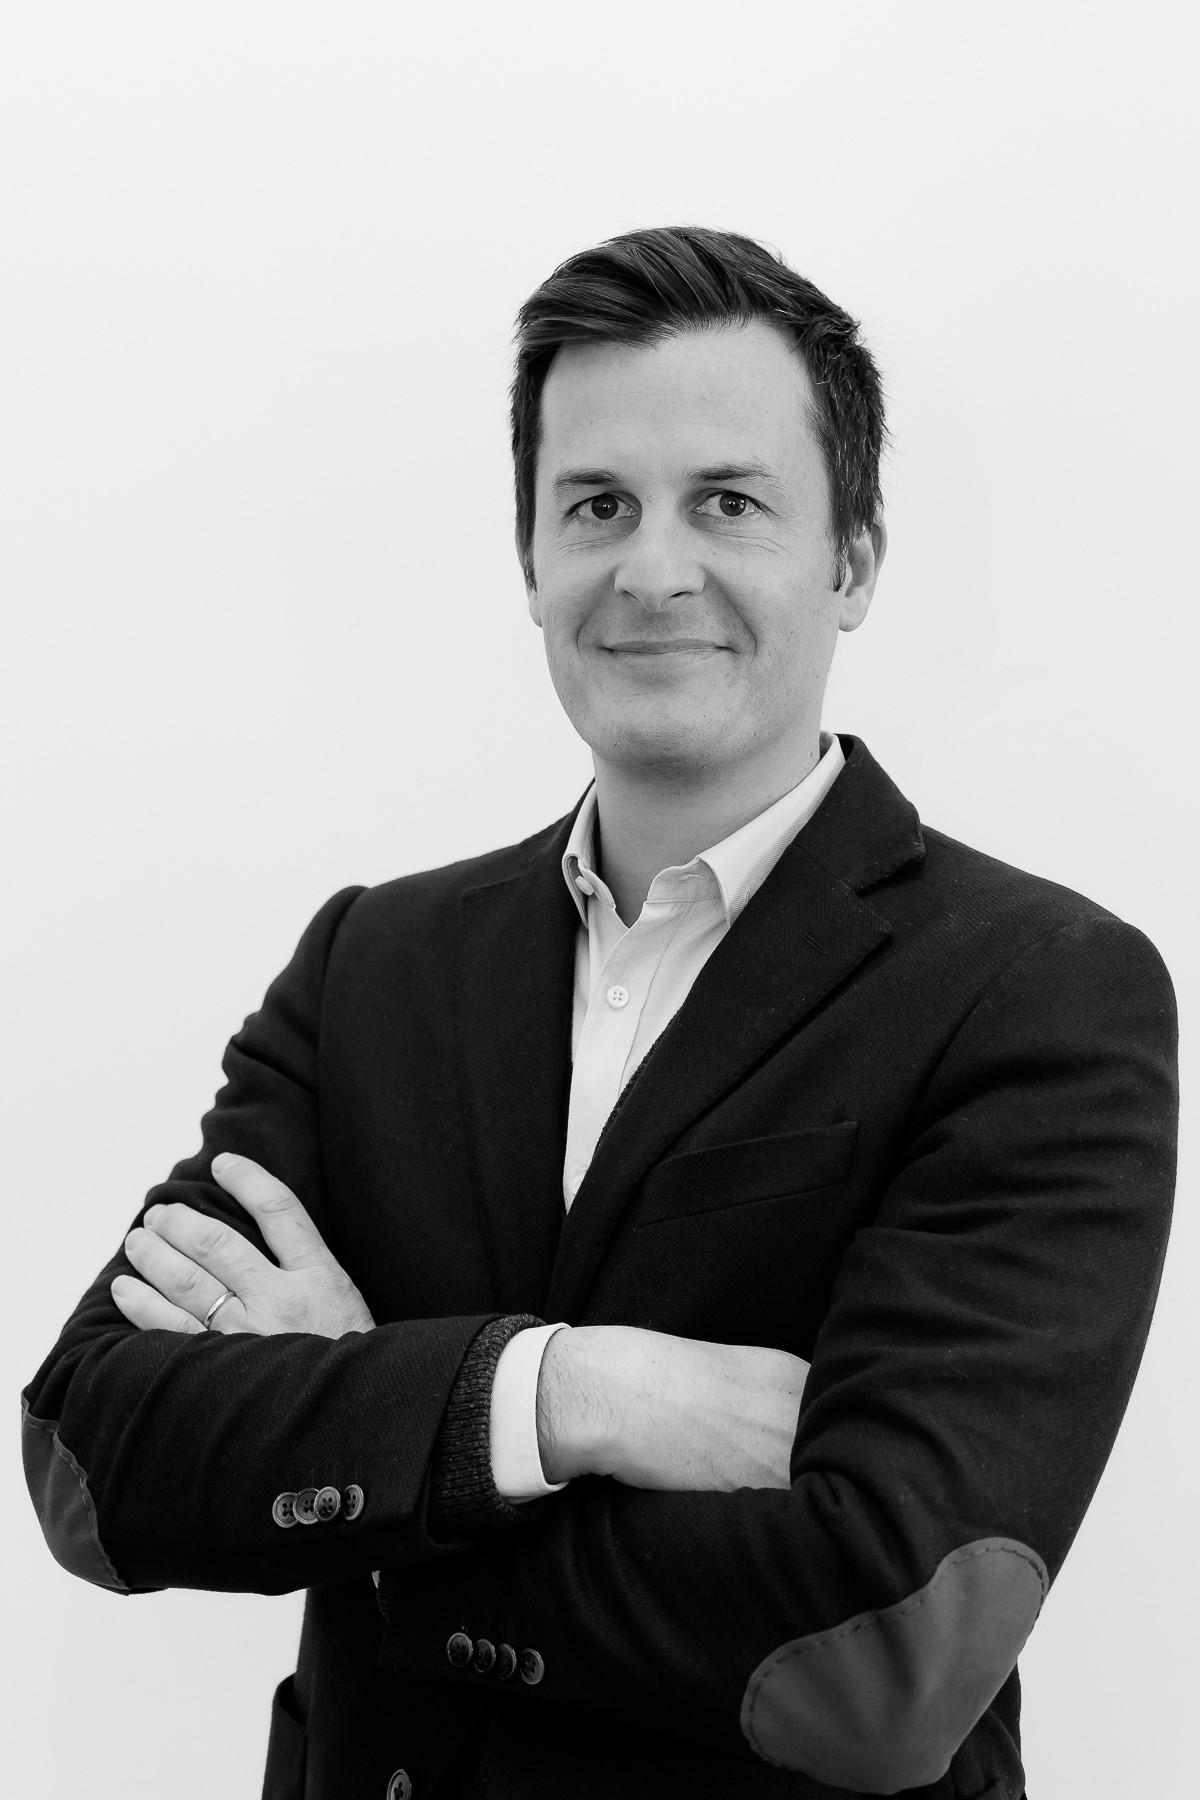 Diego Antinolo